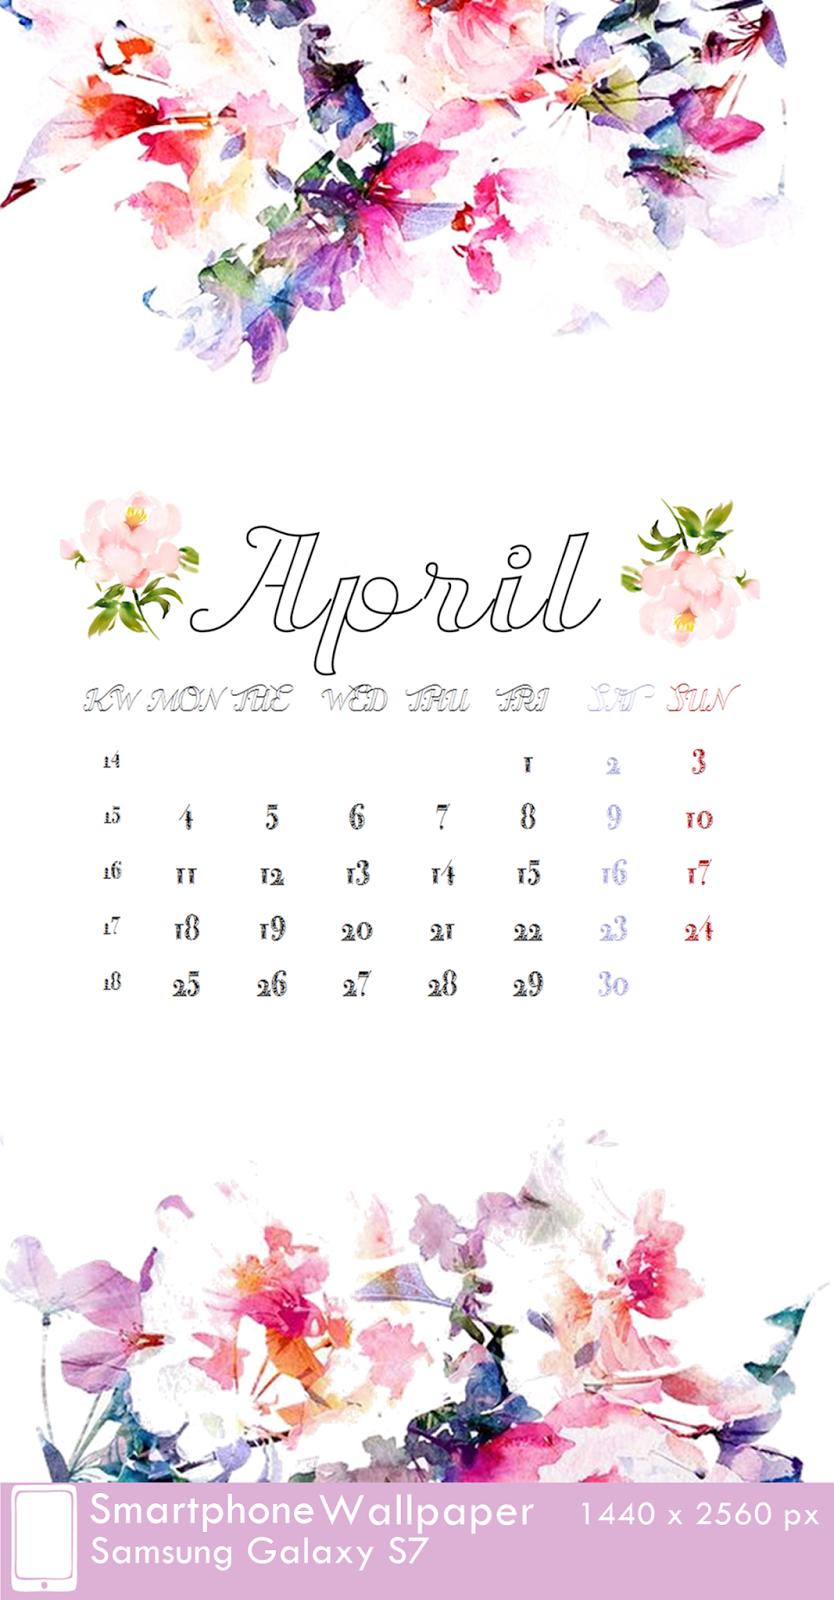 Samsung Galaxy S7 Wallpaper Calendar April 2016 fest 1440 x 2560 px